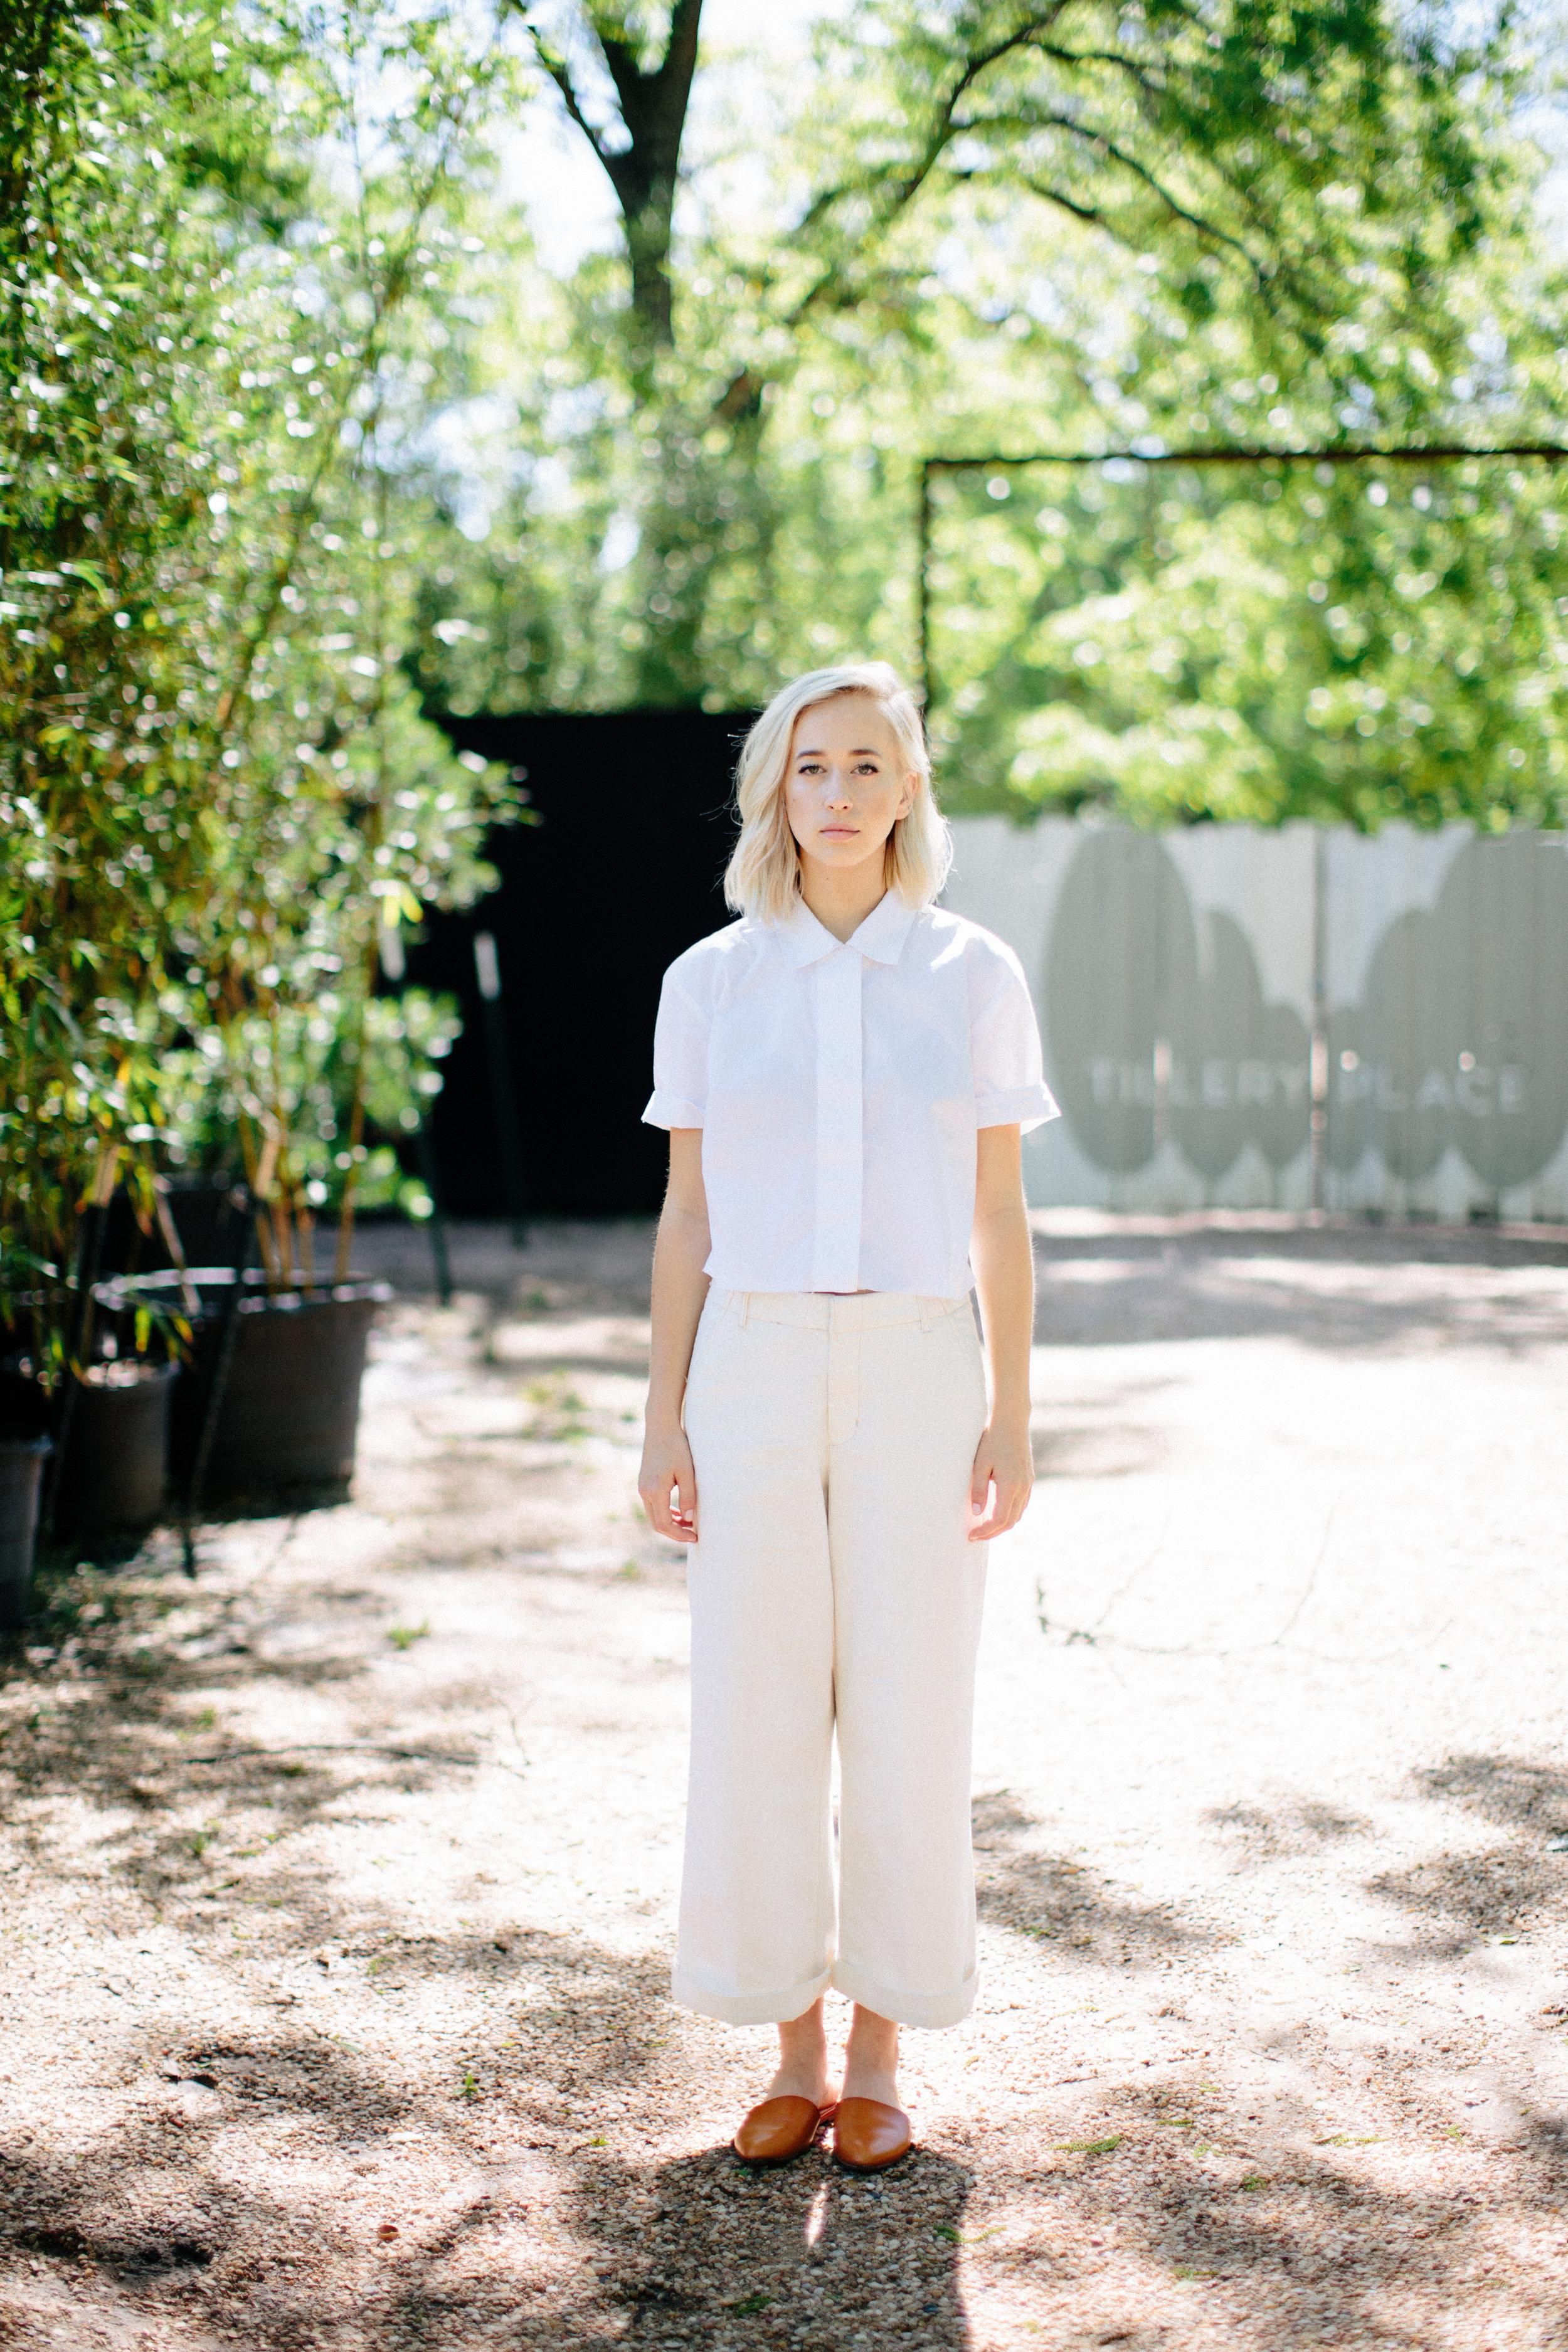 Paige-Newton-Photography-Fashion-Editorial-Lookbook.jpg